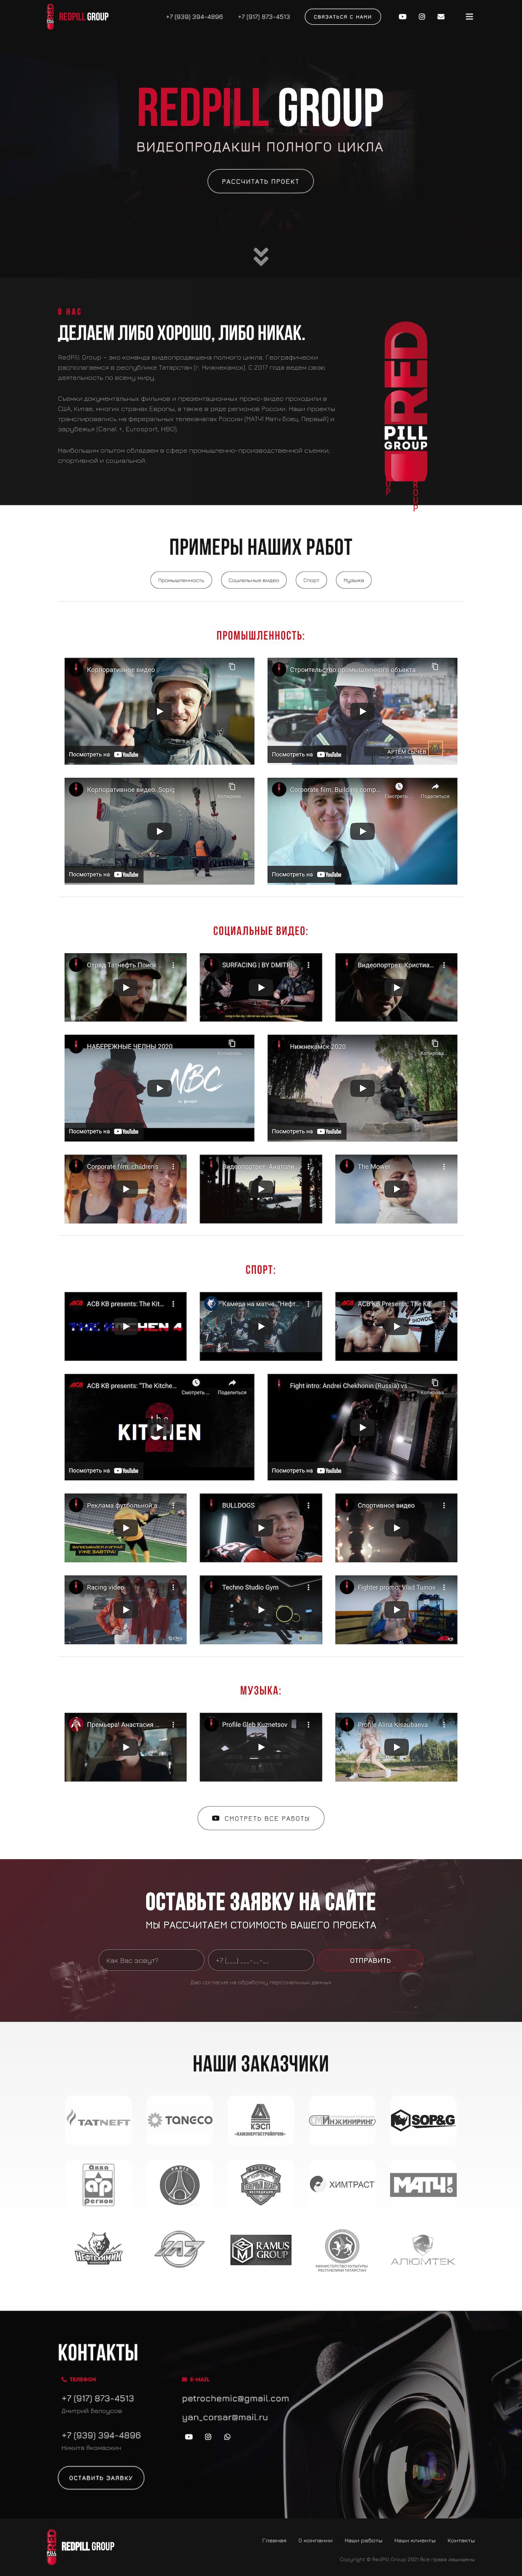 Видеопродакшн полного цикла